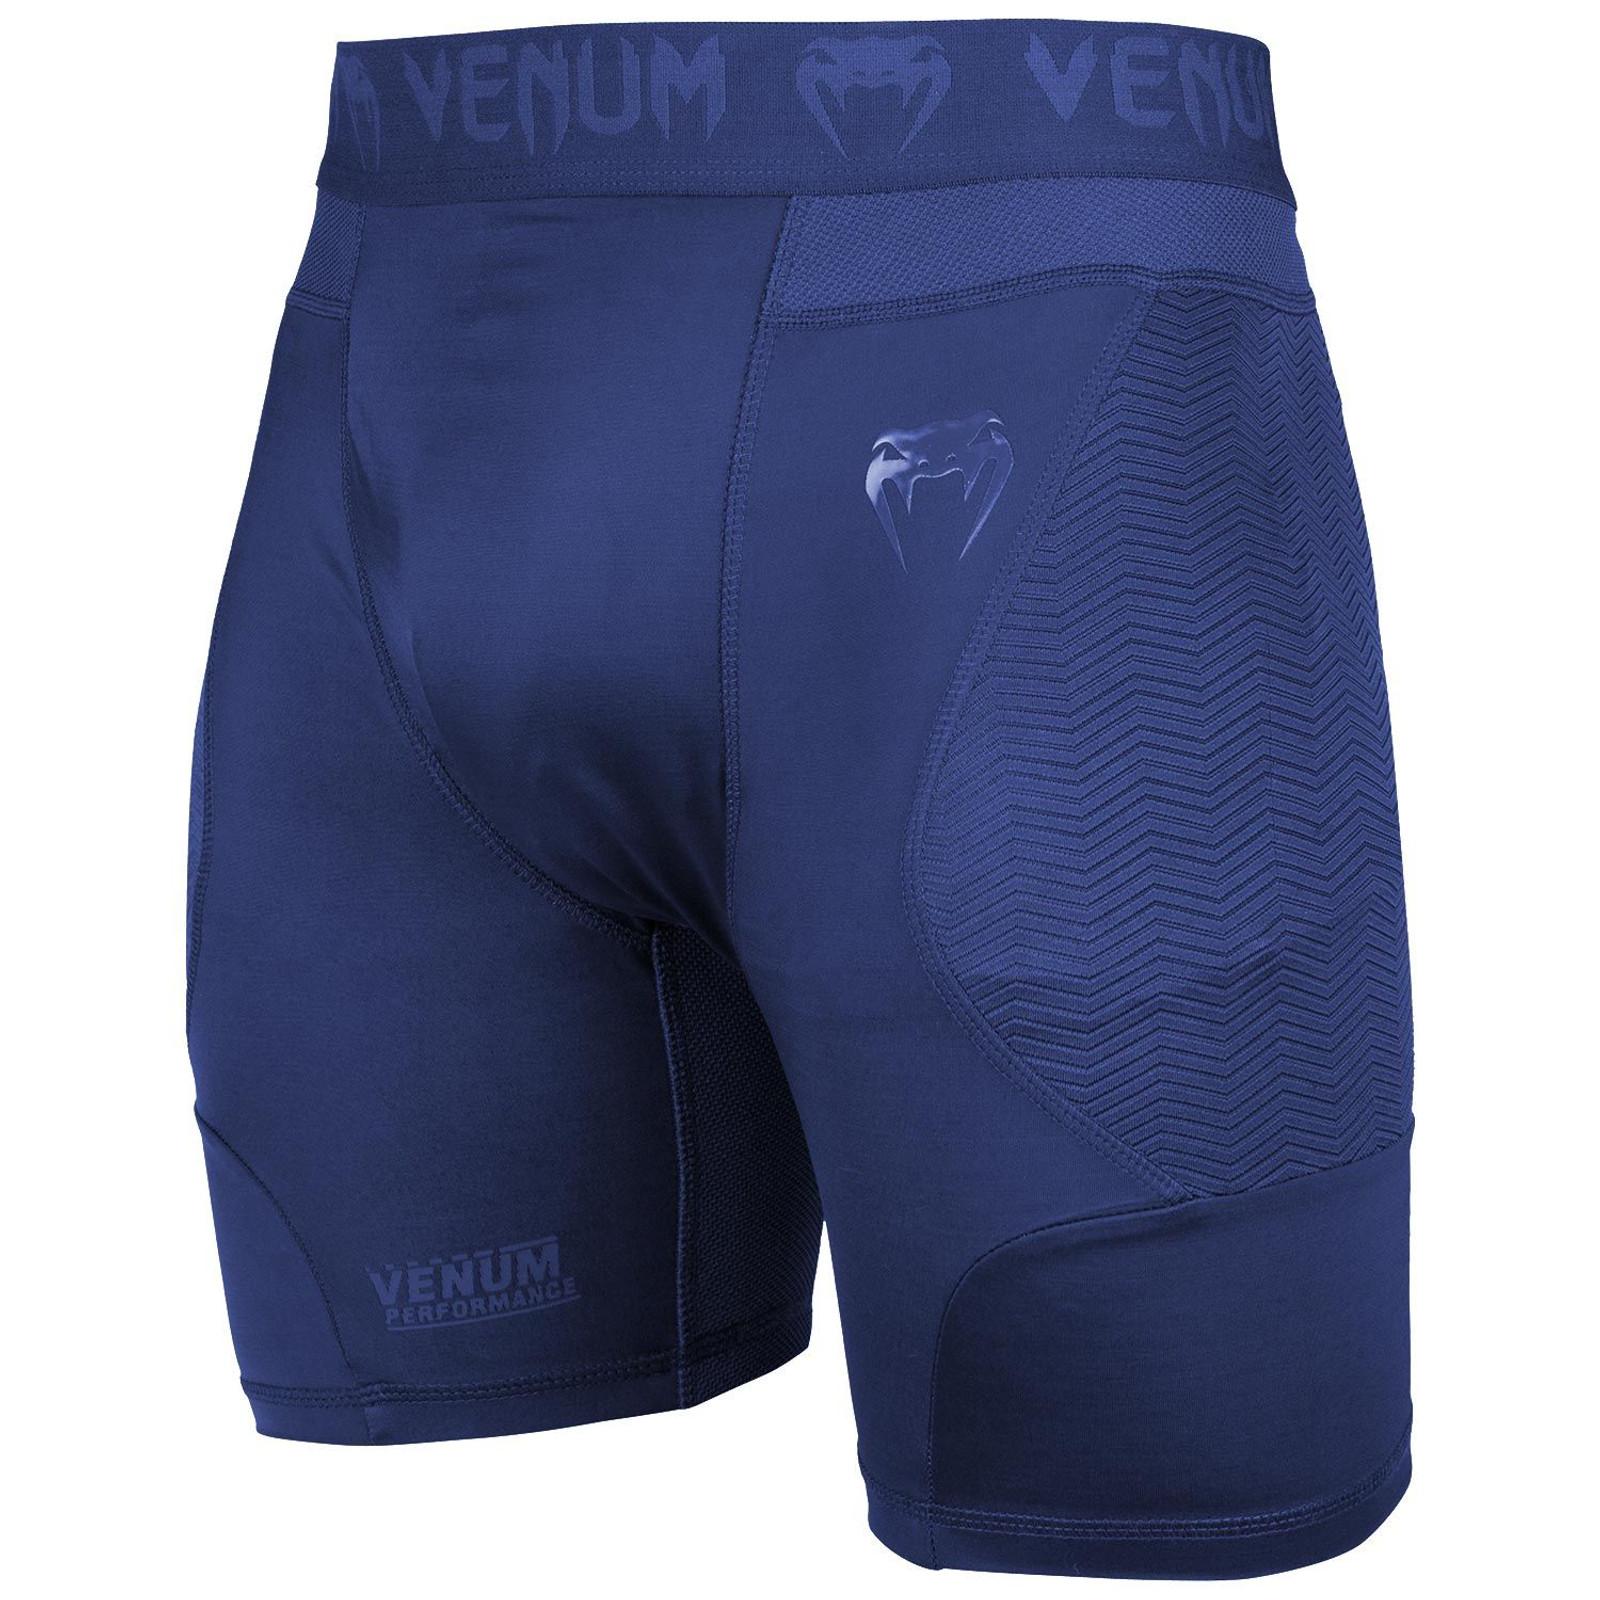 Venum Herren Kompressions Shorts G-Fit